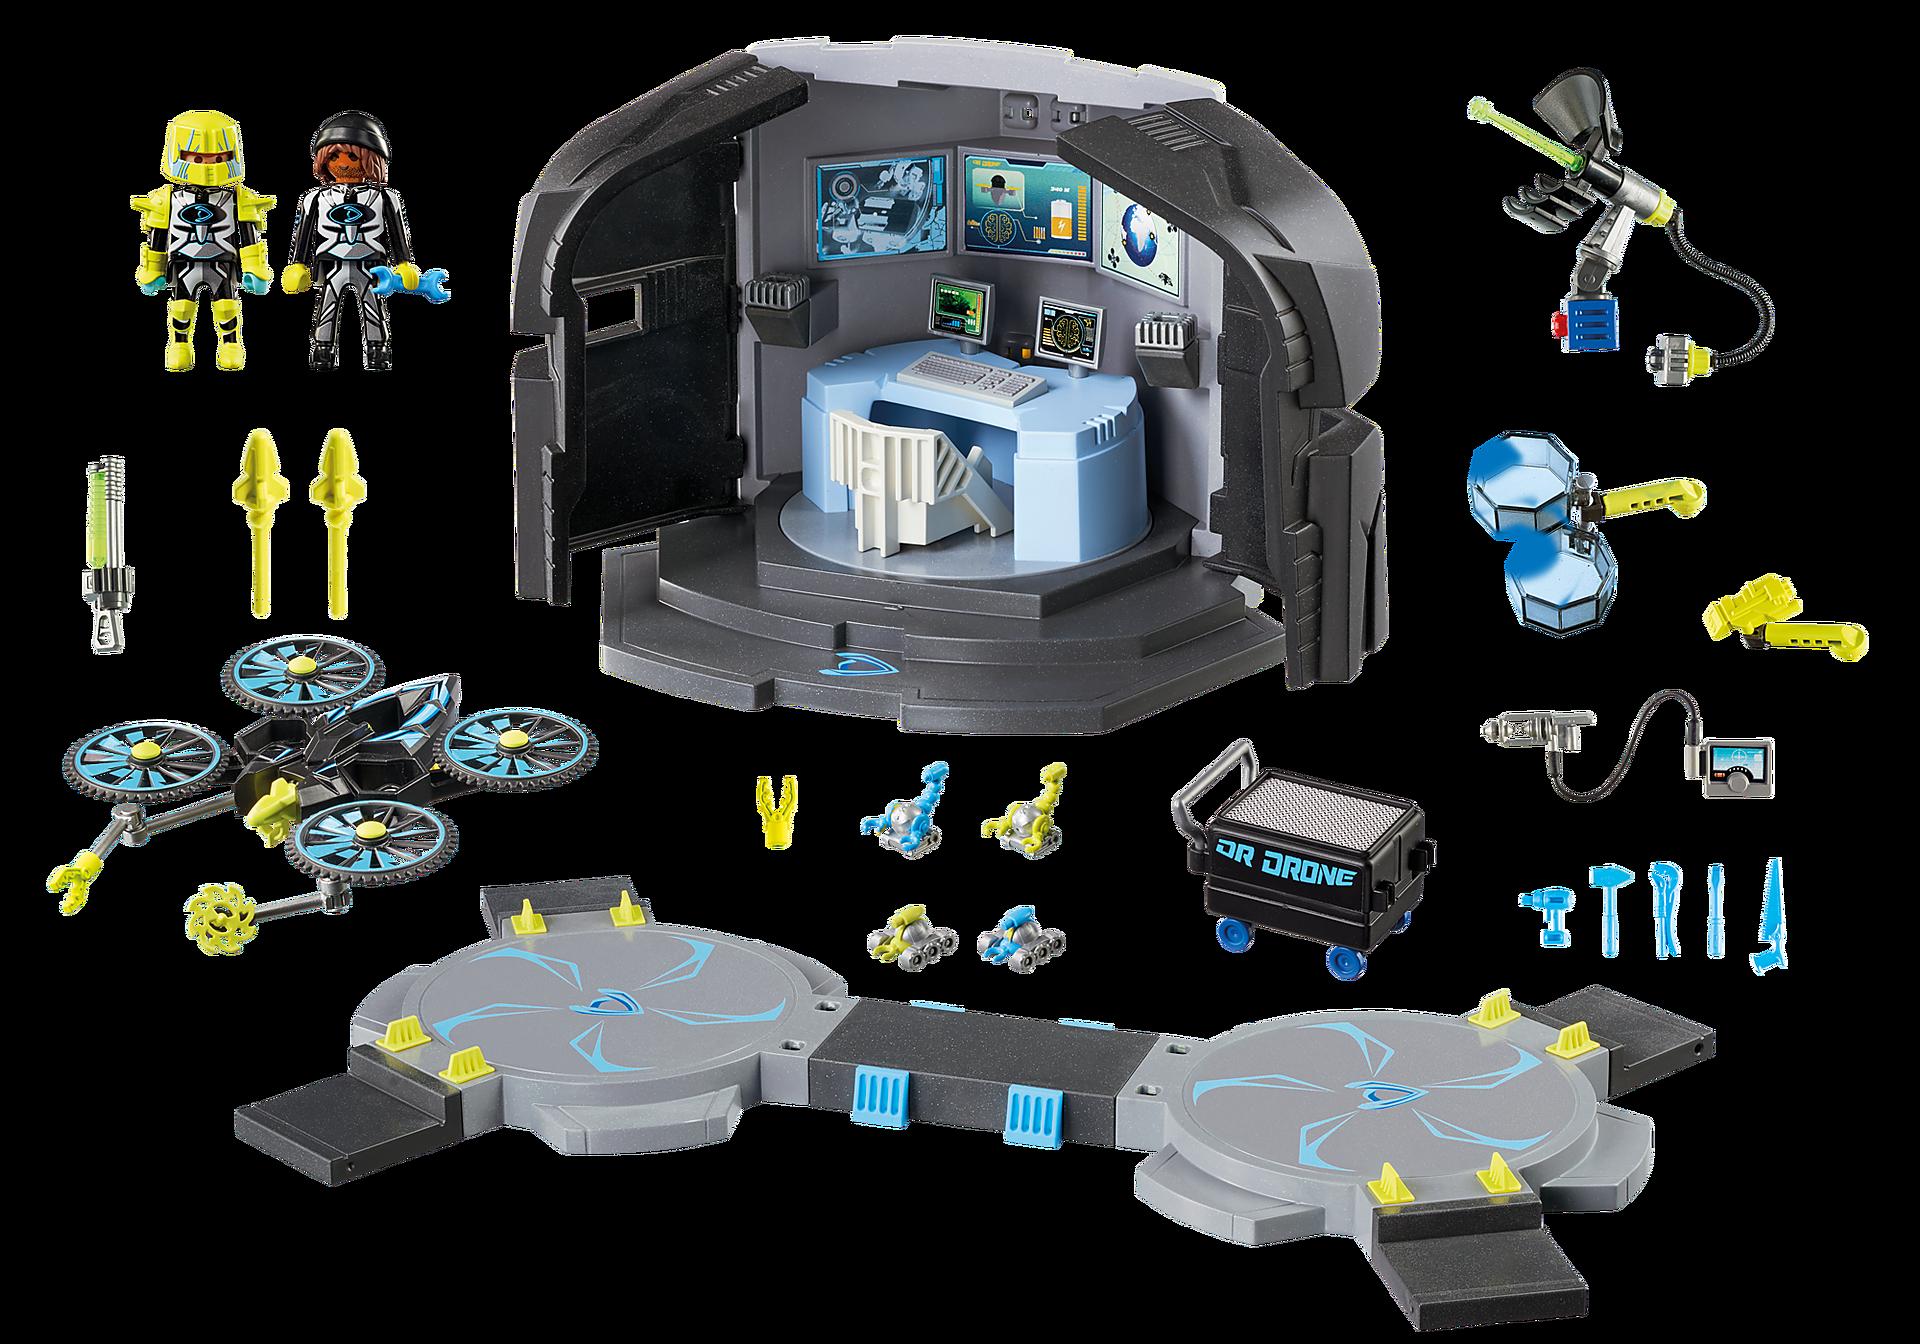 http://media.playmobil.com/i/playmobil/9250_product_box_back/Dr. Drone's Command Center